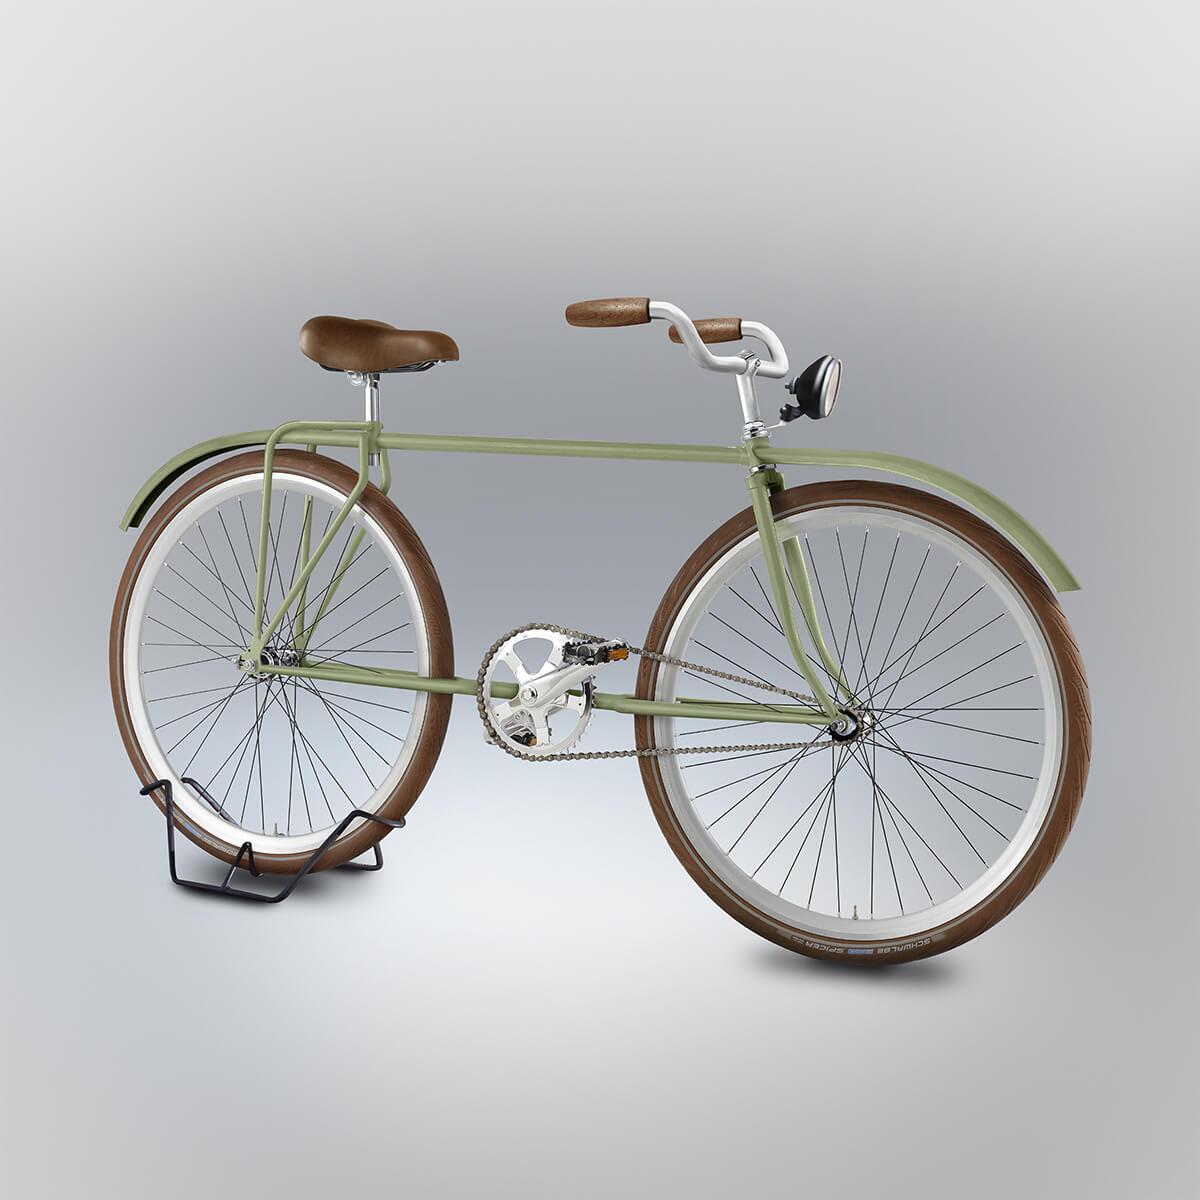 gianluca-gimini-bikes-24